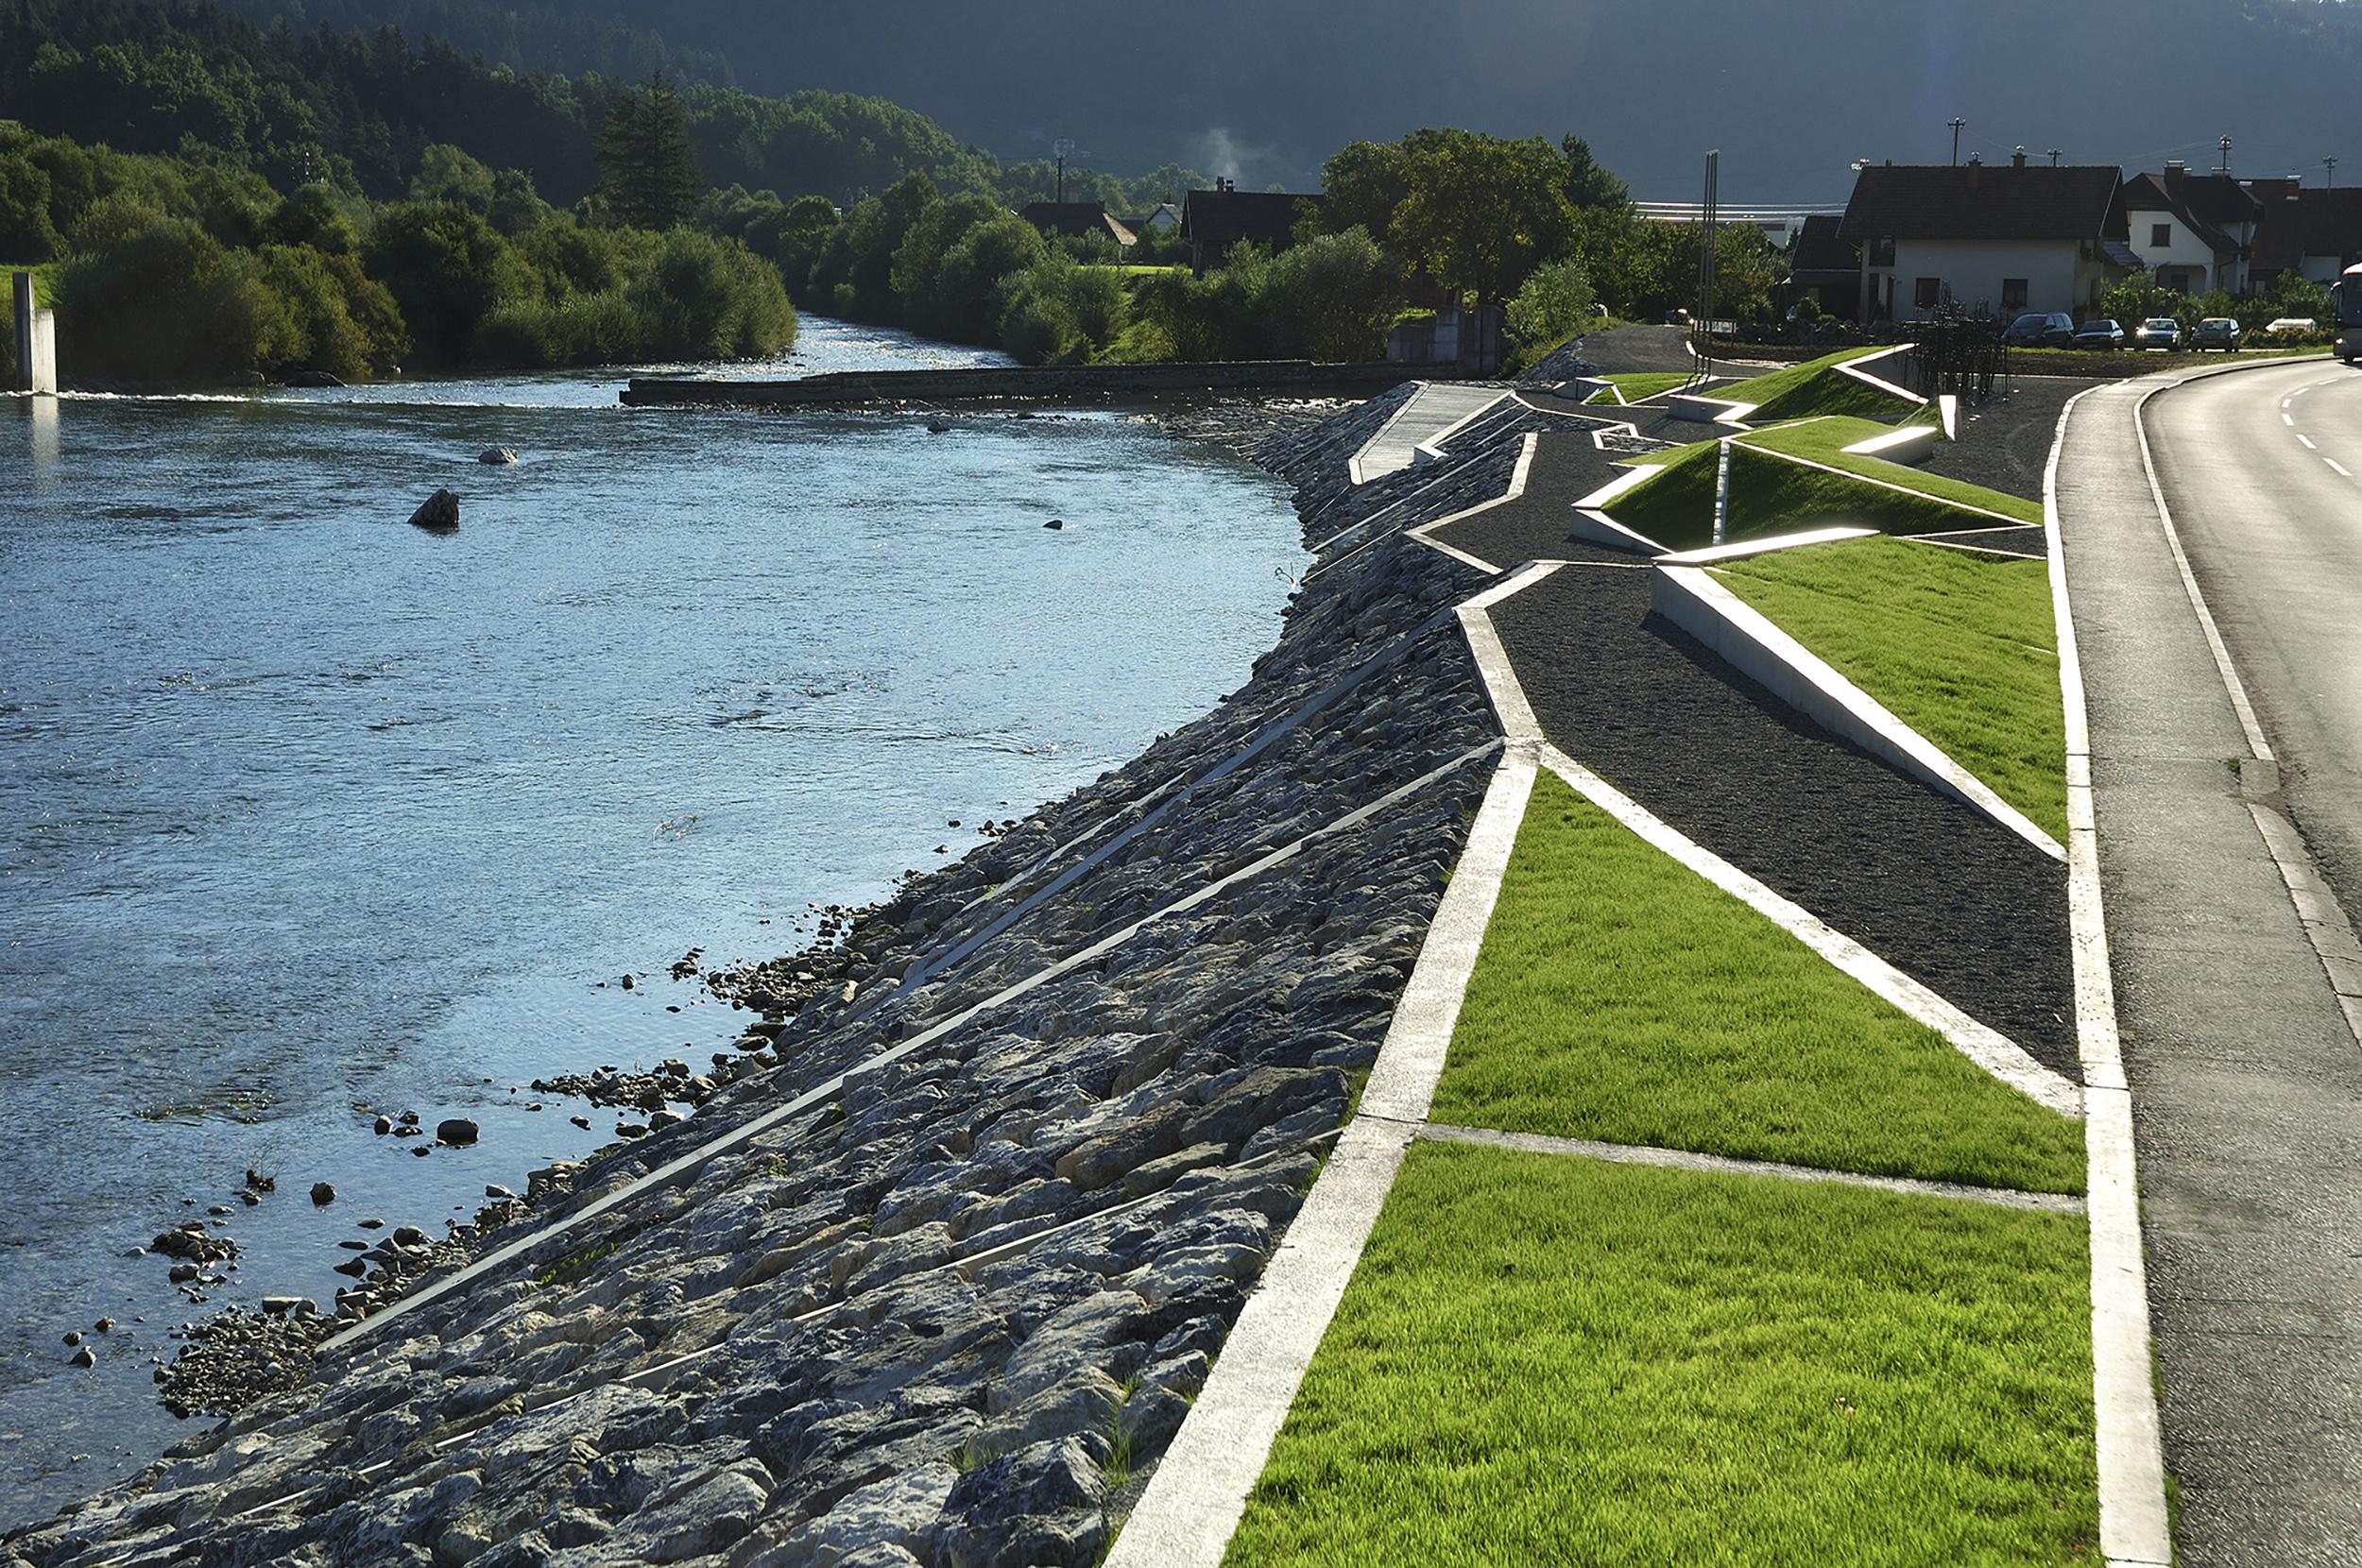 bruto park maister ljubno ob savinji reka river sculpture skulptura